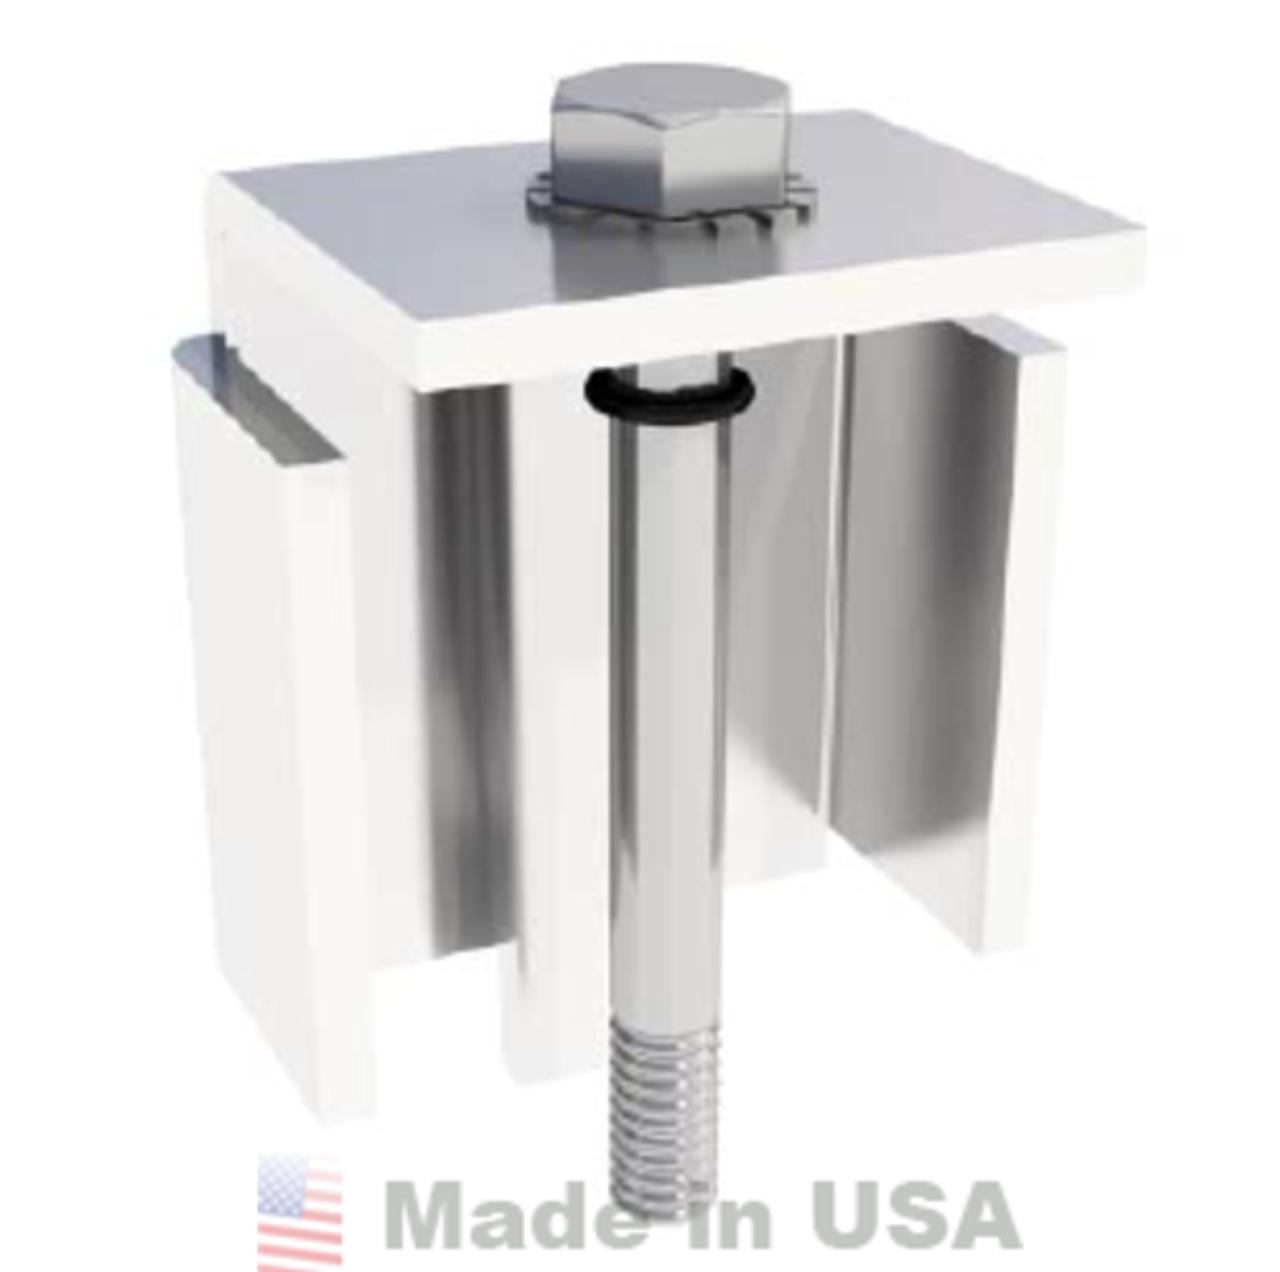 IronRidge BRM Ballast Module Clamp (Fits 38.5mm - 39.4mm)